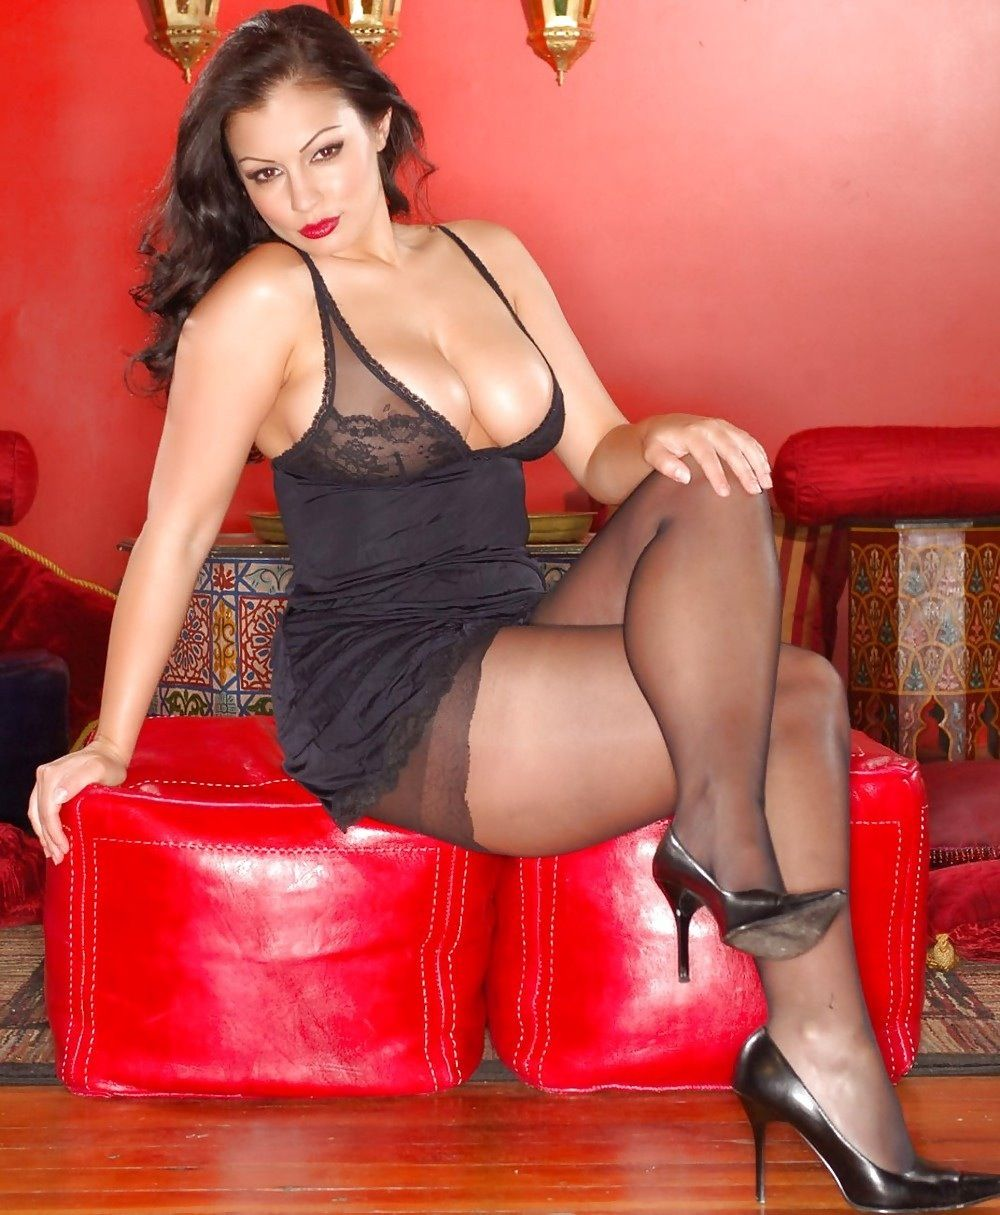 Bbw Lingerie Tumblr Top hottness: aria | curvalicious | pinterest | curves, lingerie and curvy